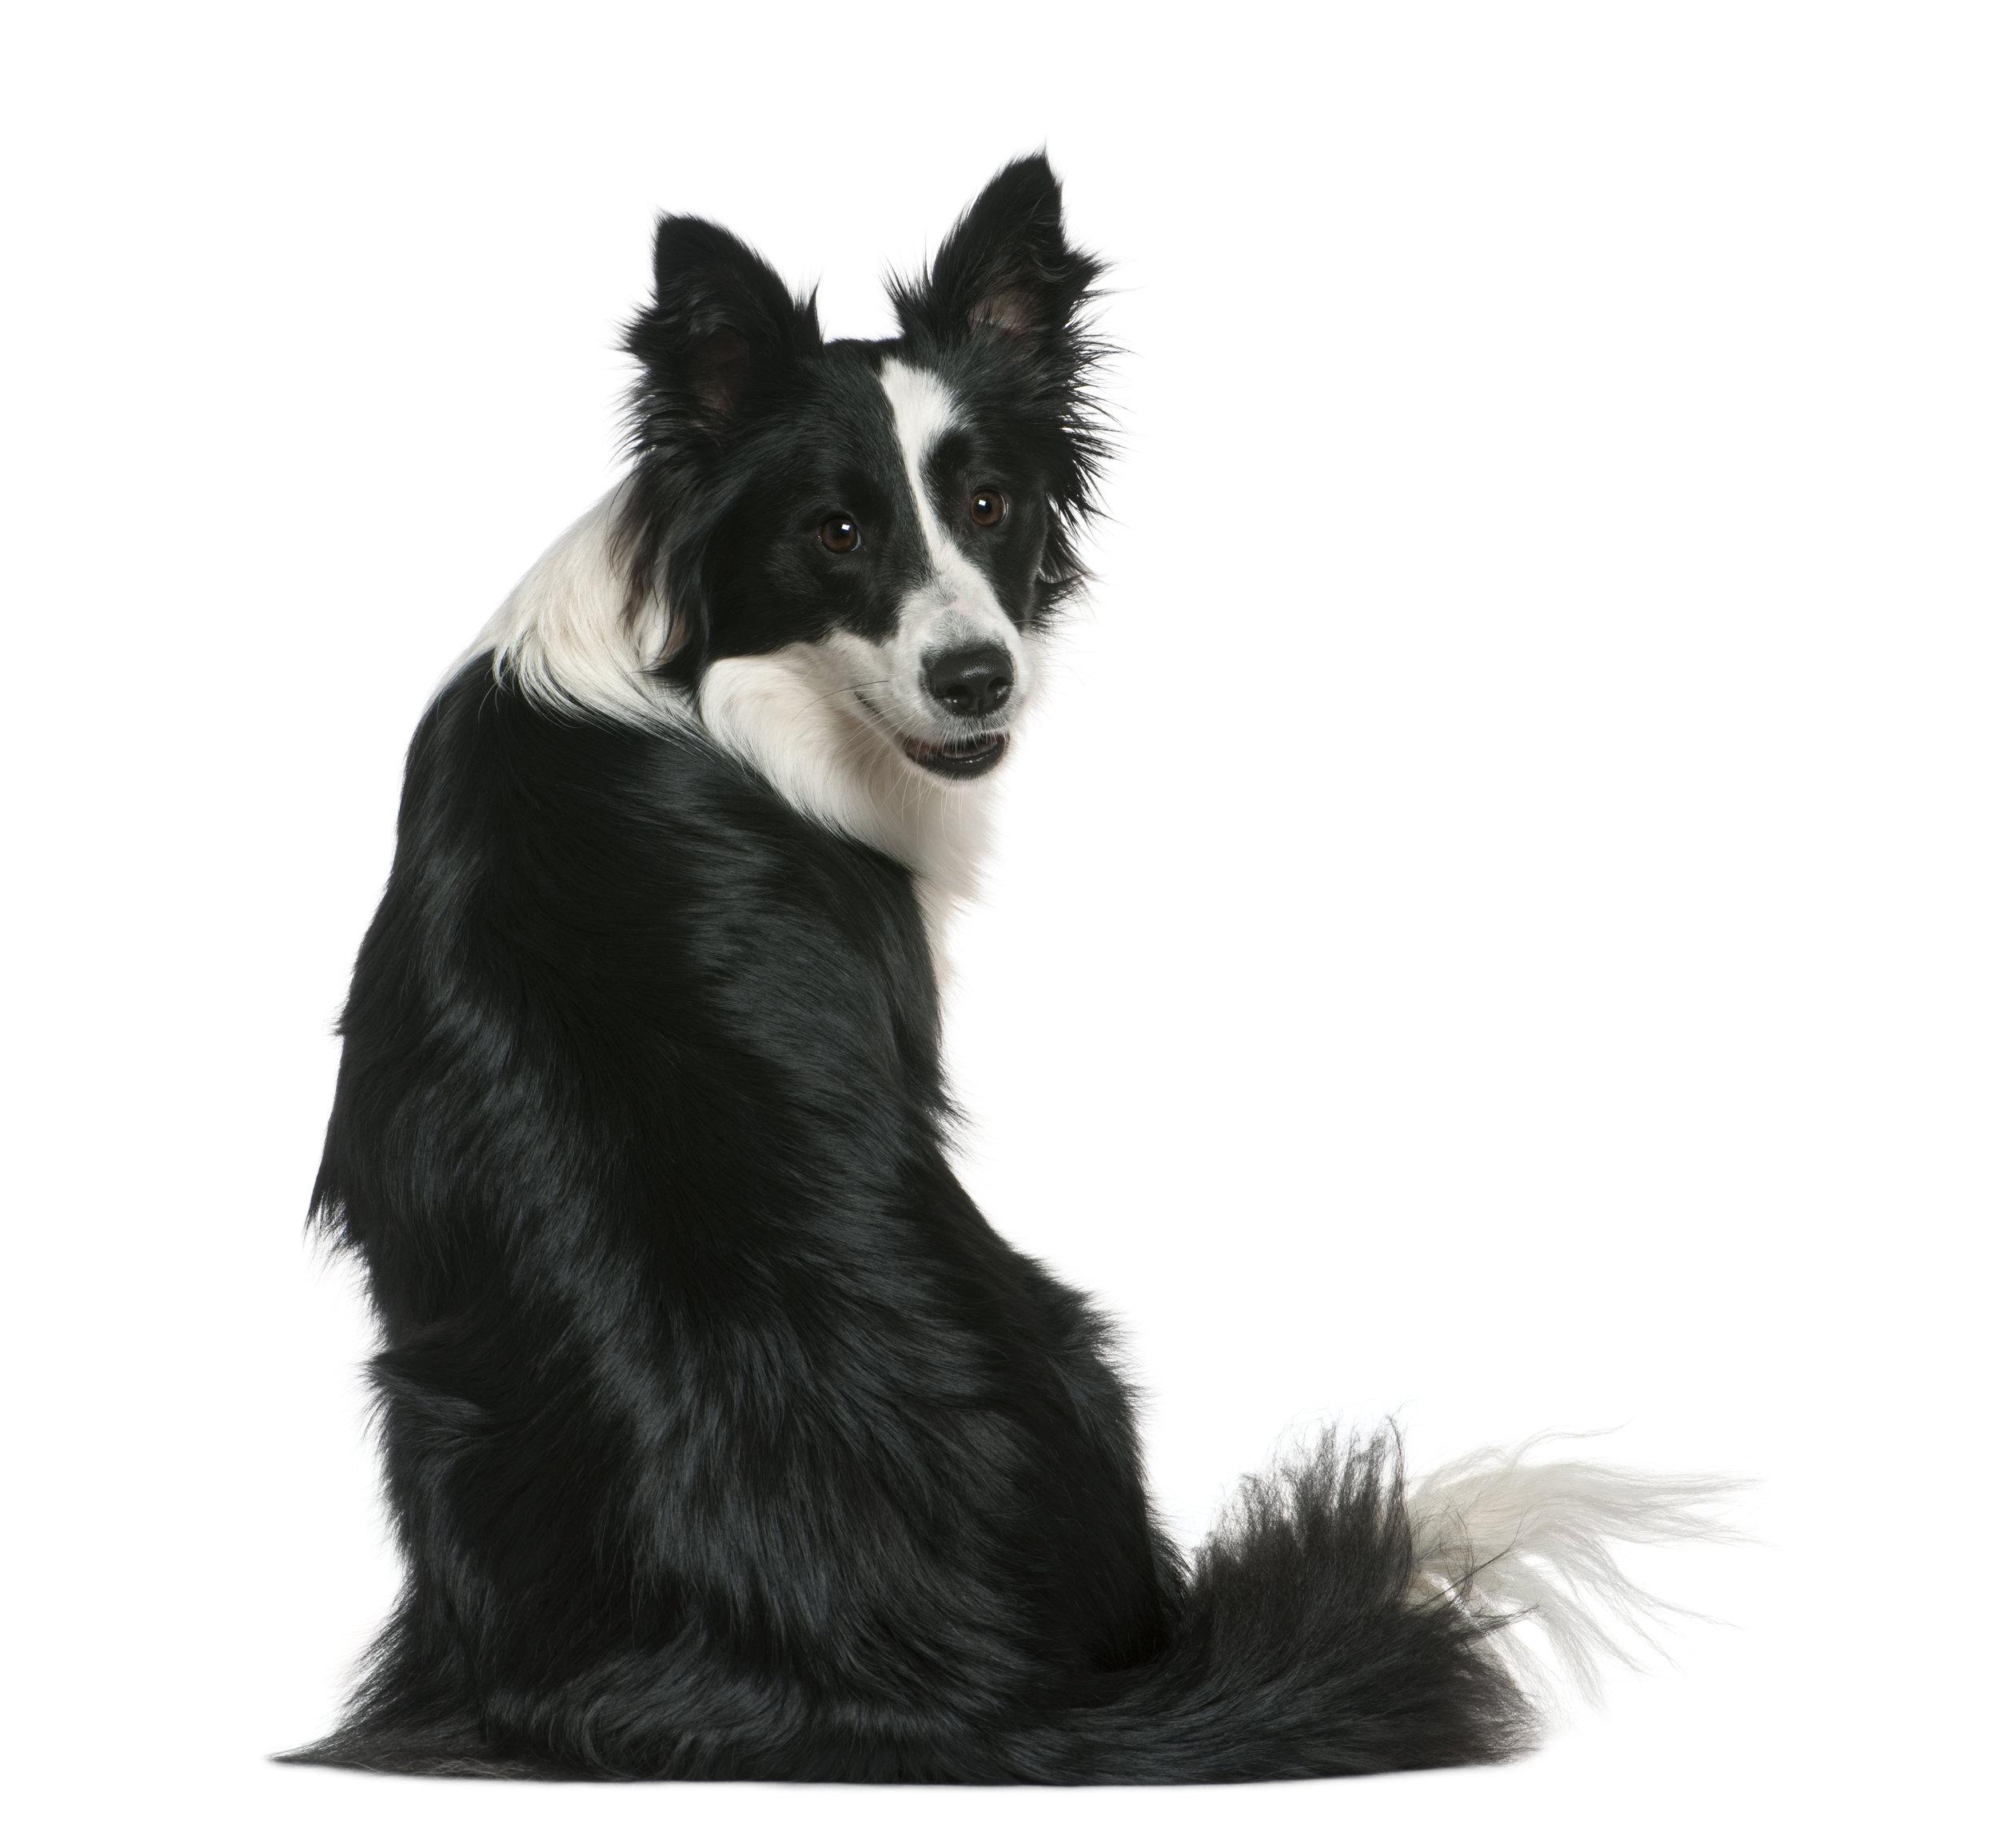 Best International foundation positive reinforcement clicker training dog training seminars in Europe, Canada, Australia, Asia.